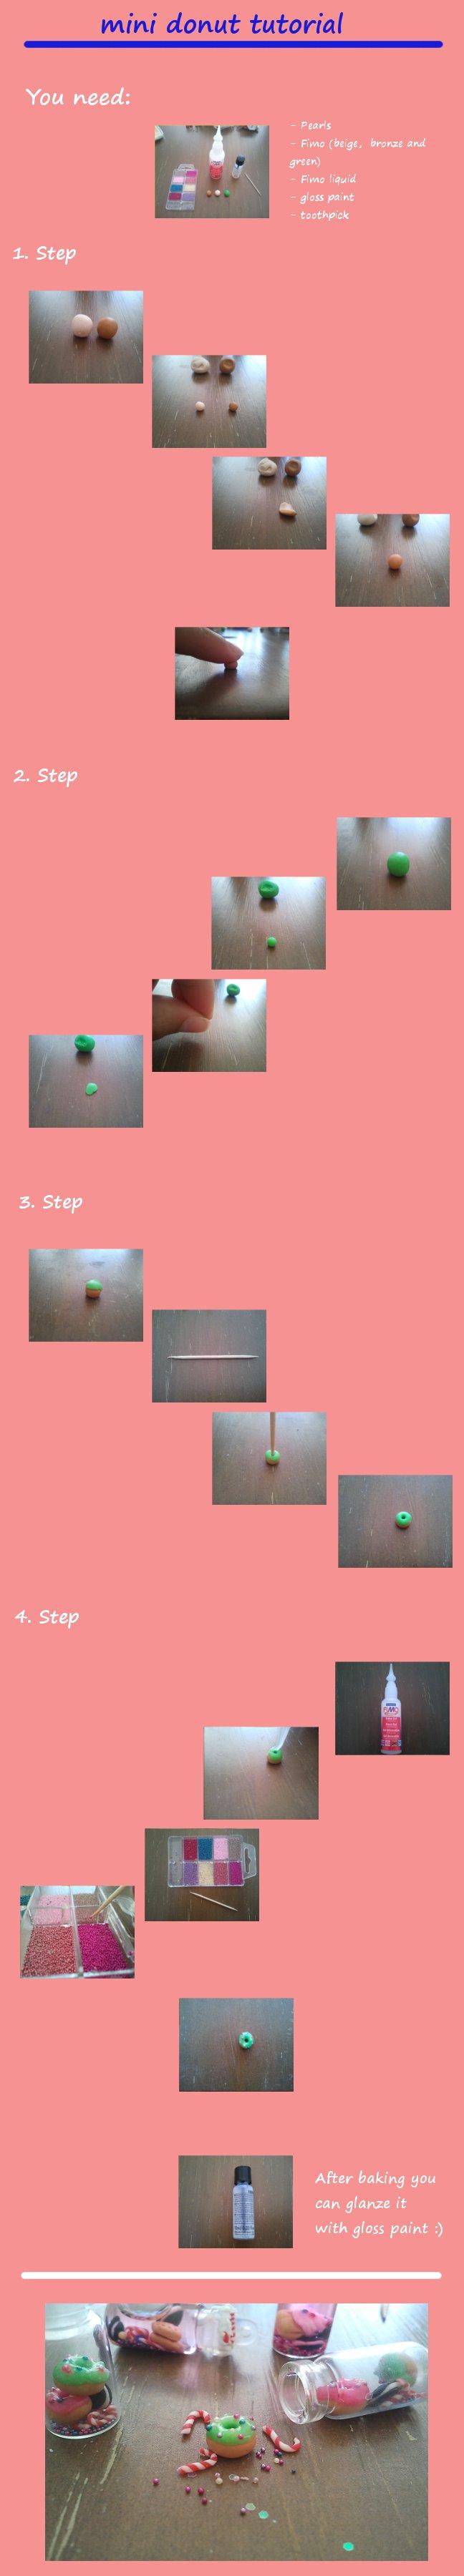 mini donut tutorial by Kittychen226